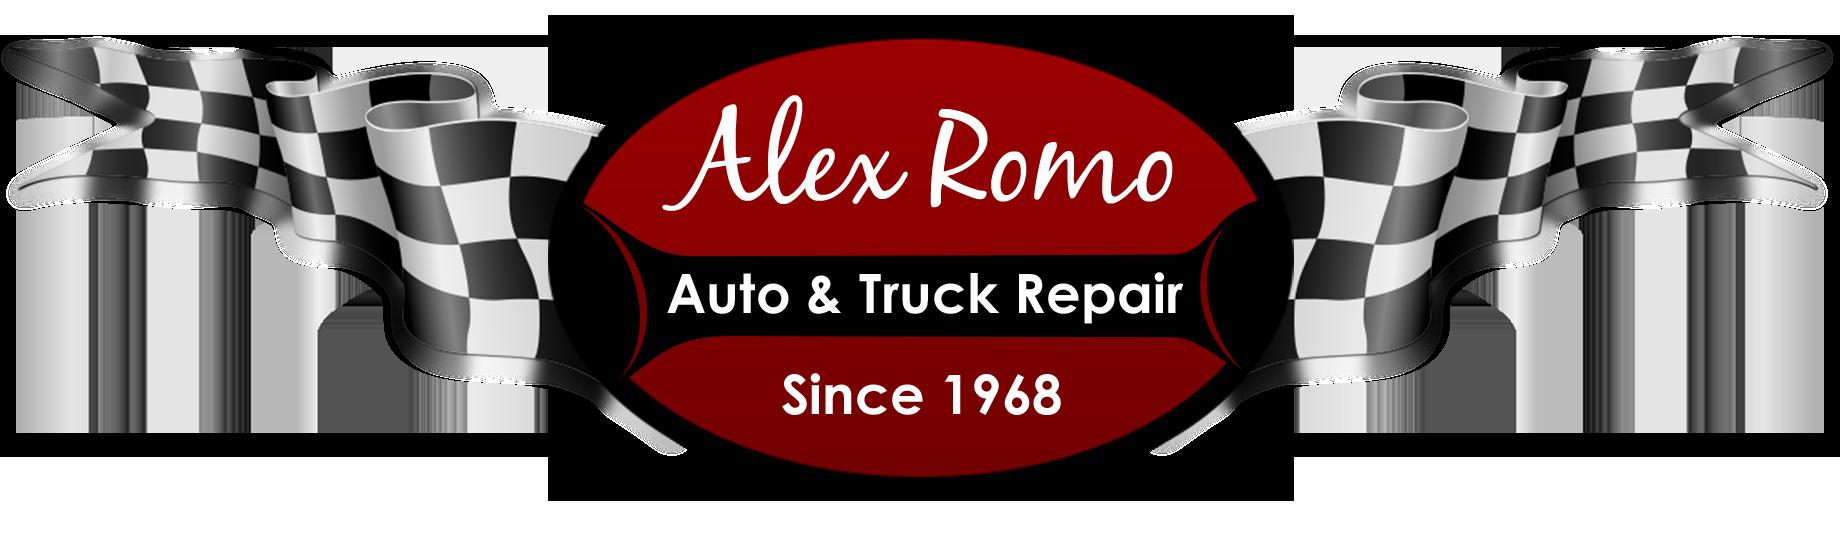 Alex Romo Auto - Auto Brake Service, Transparent background PNG HD thumbnail